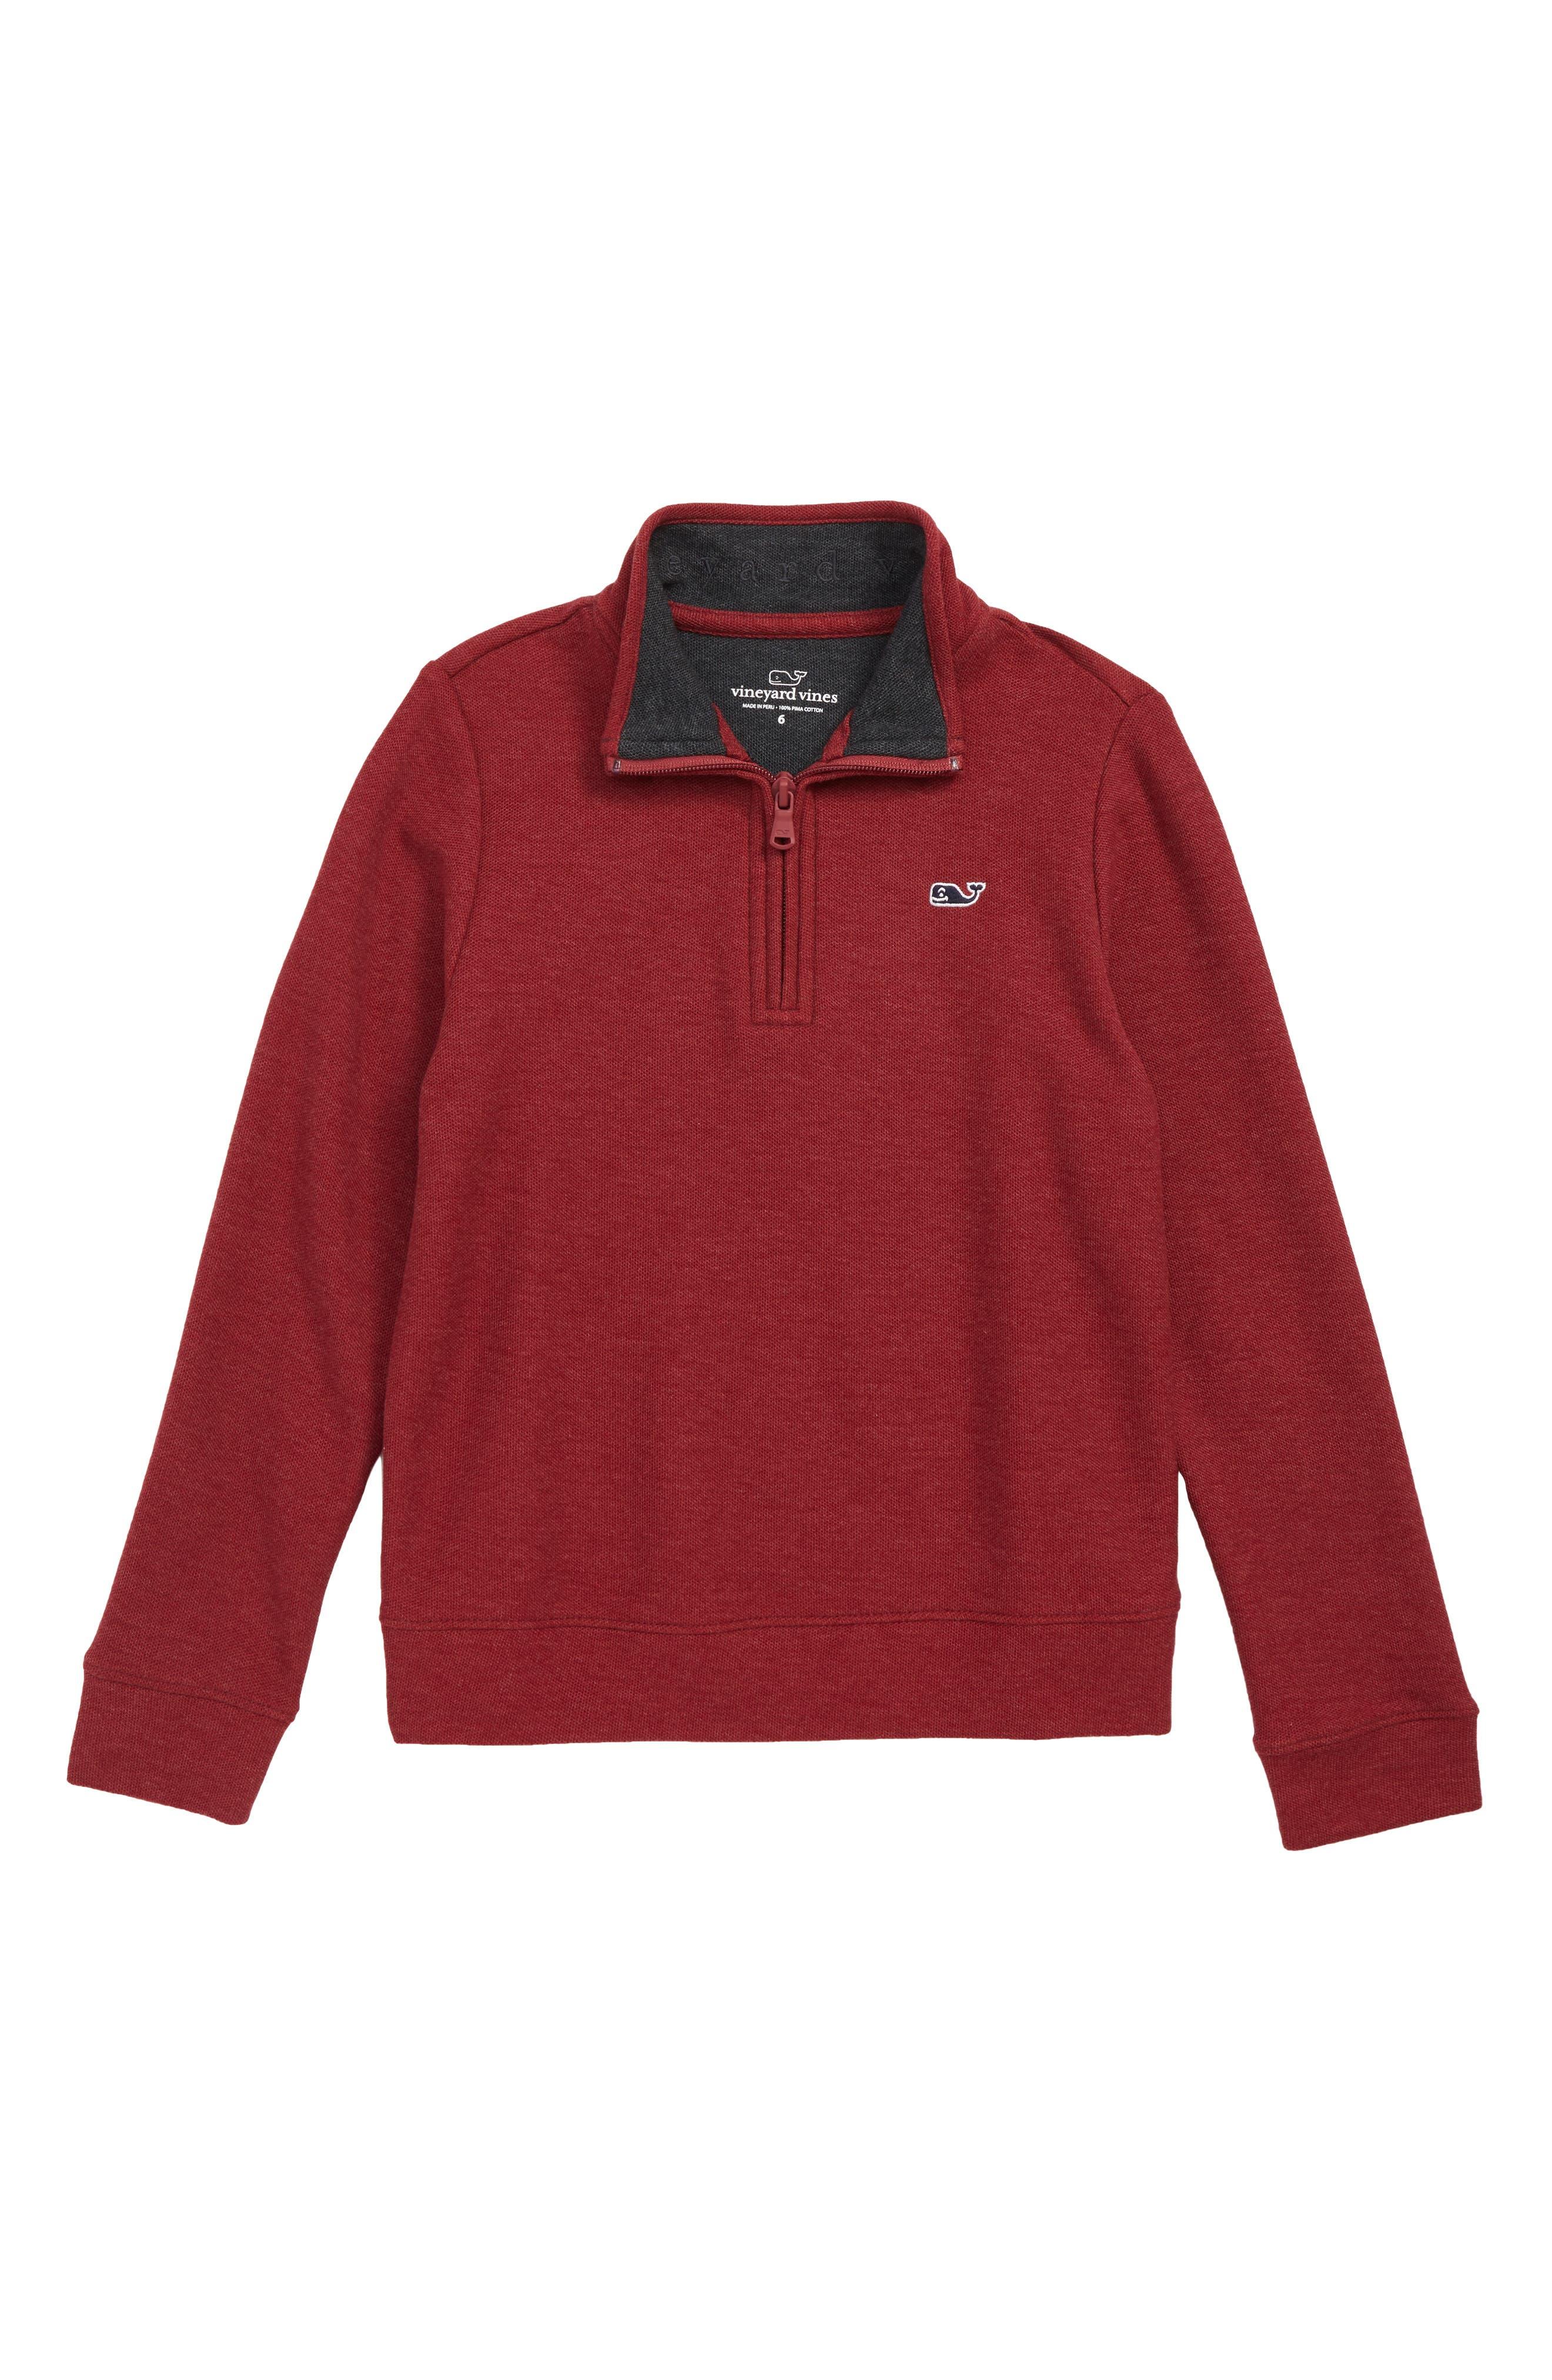 Quarter Zip Sweater,                             Main thumbnail 1, color,                             603